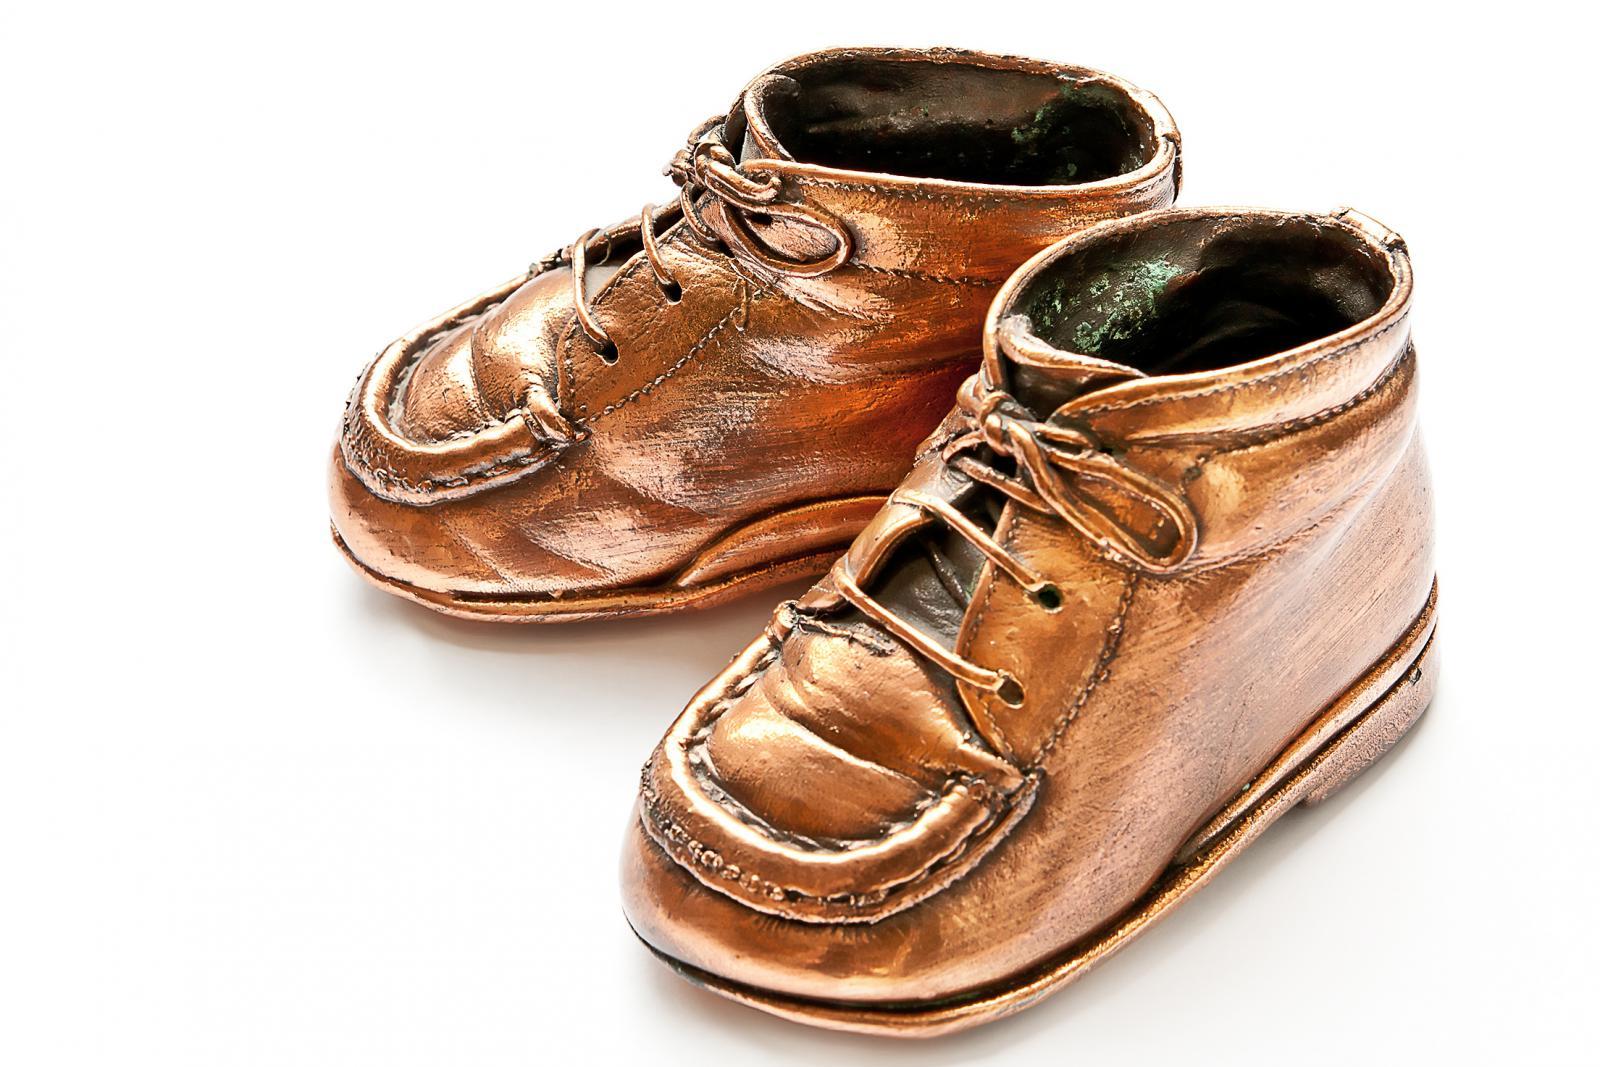 Bronze Baby Shoes | LoveToKnow